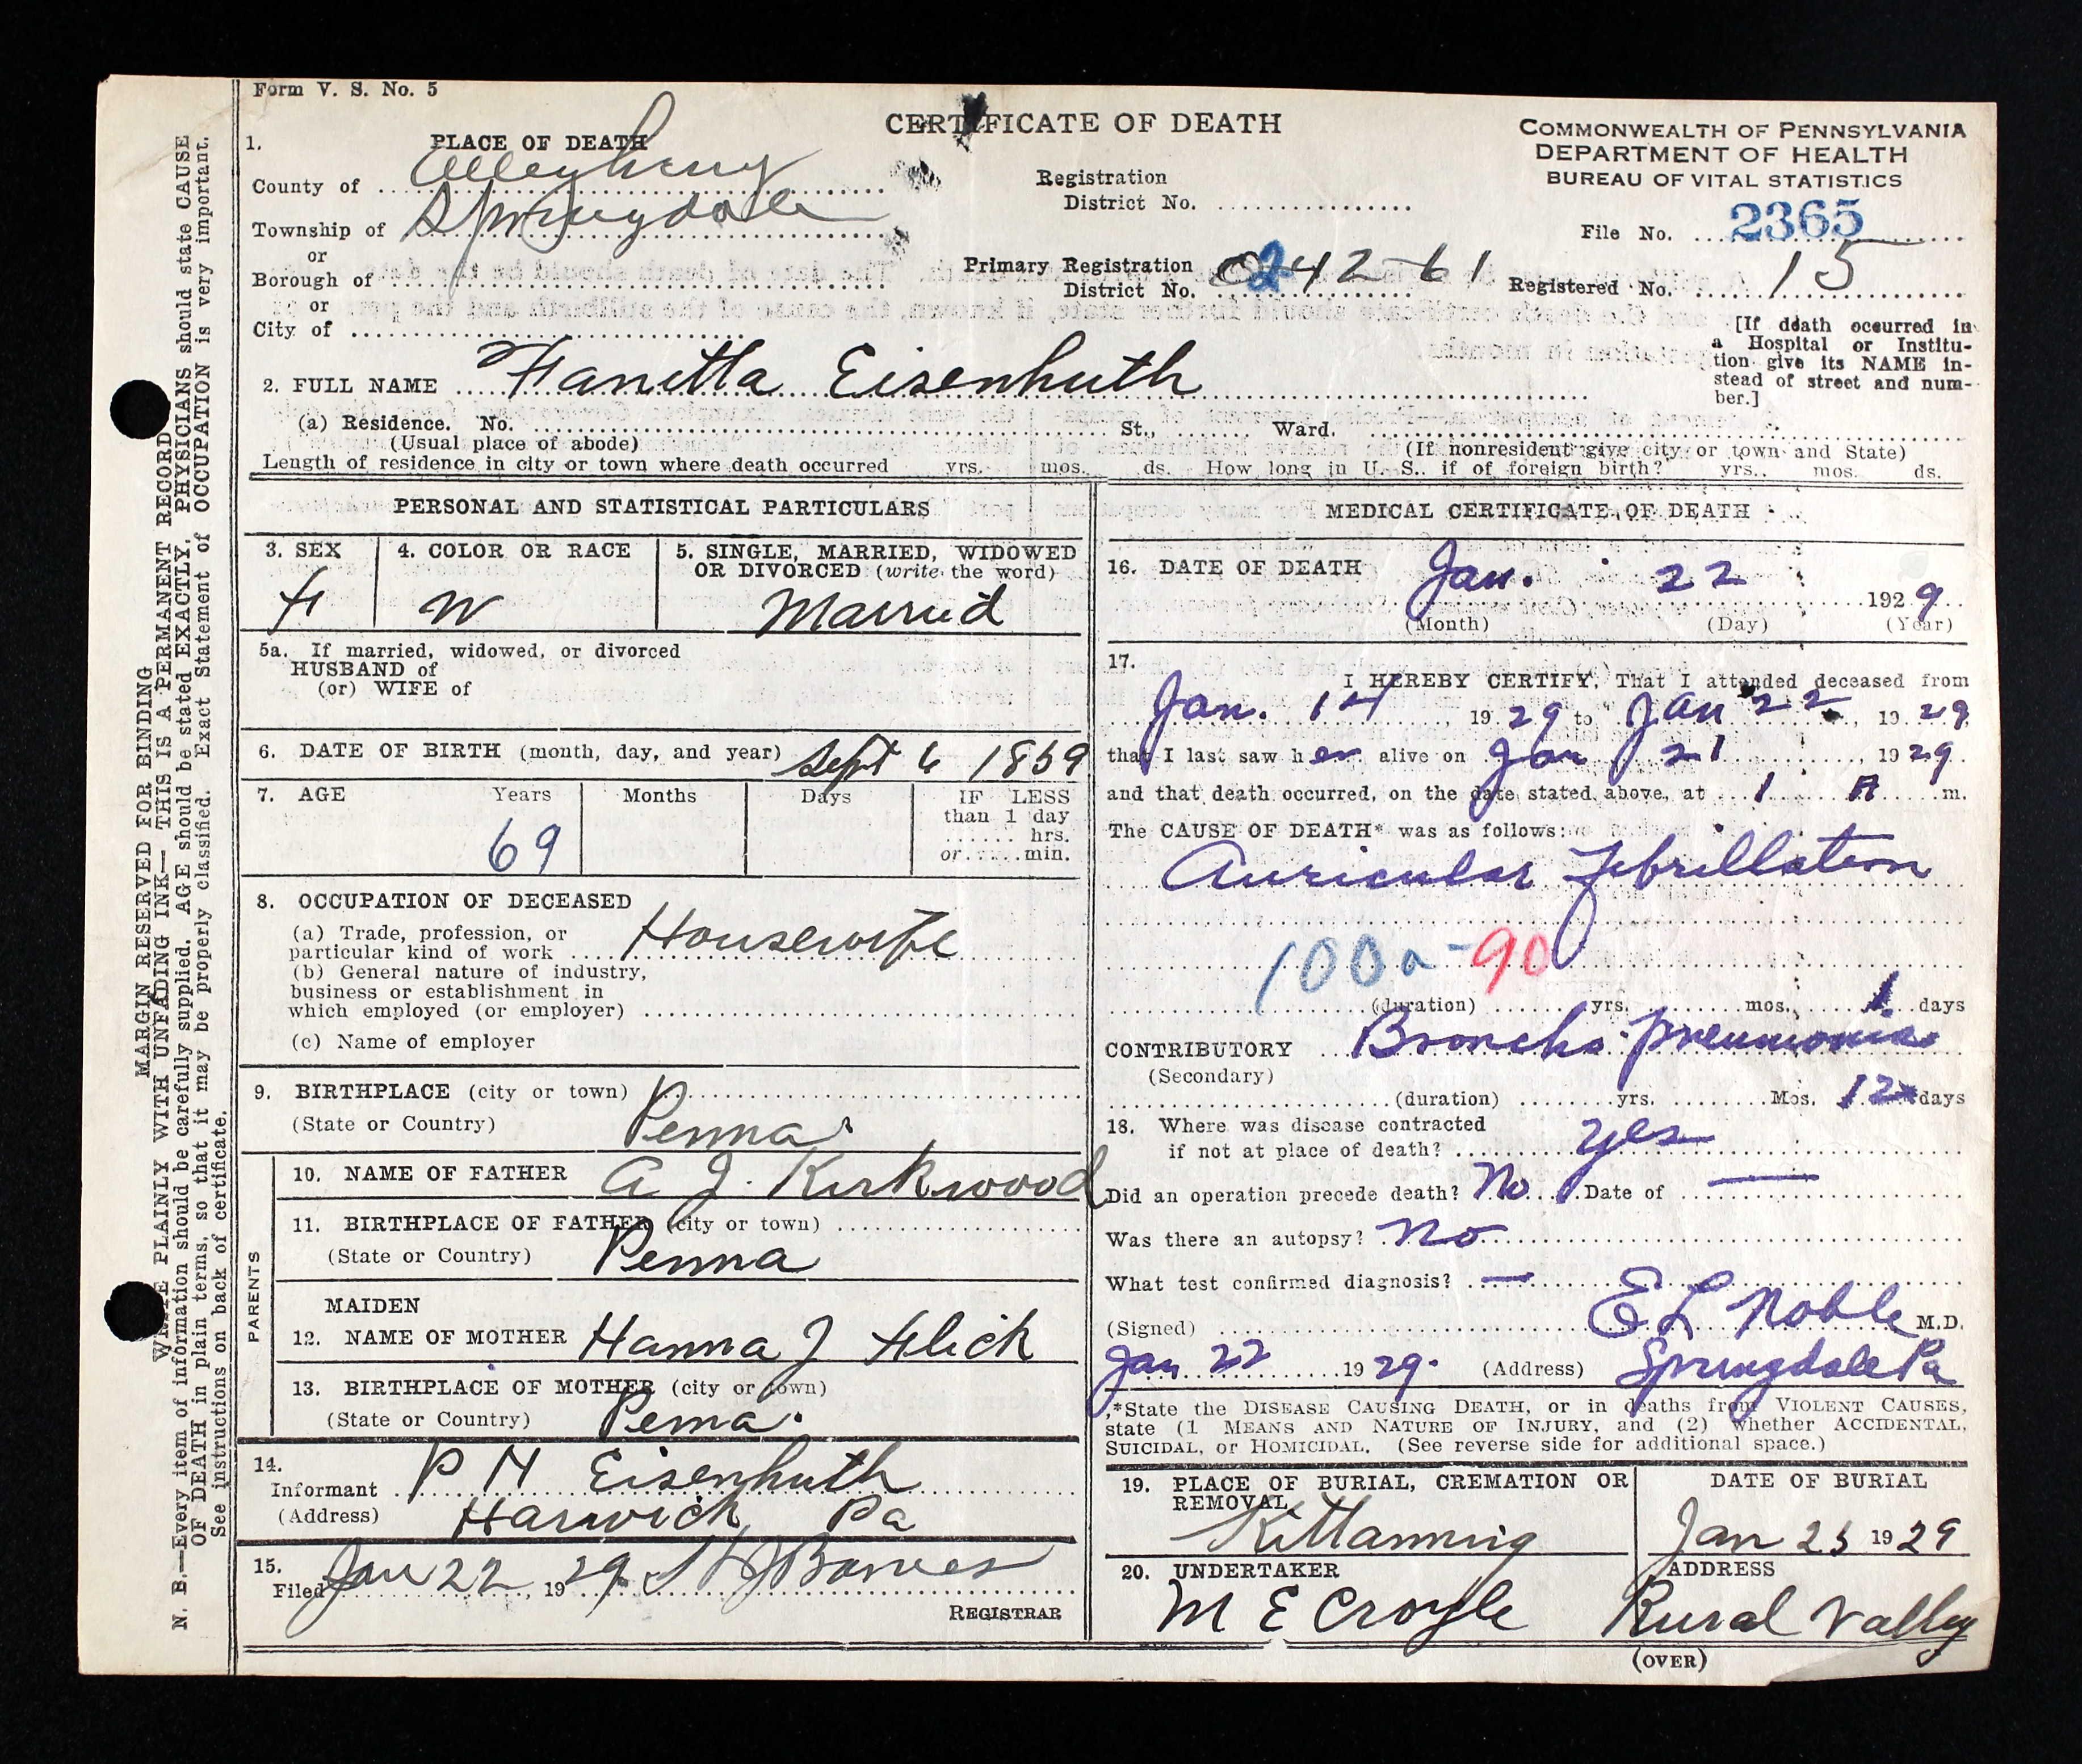 Fanetta v kirkwood eisenhuth 1859 1929 find a grave memorial death certificate public record xflitez Choice Image